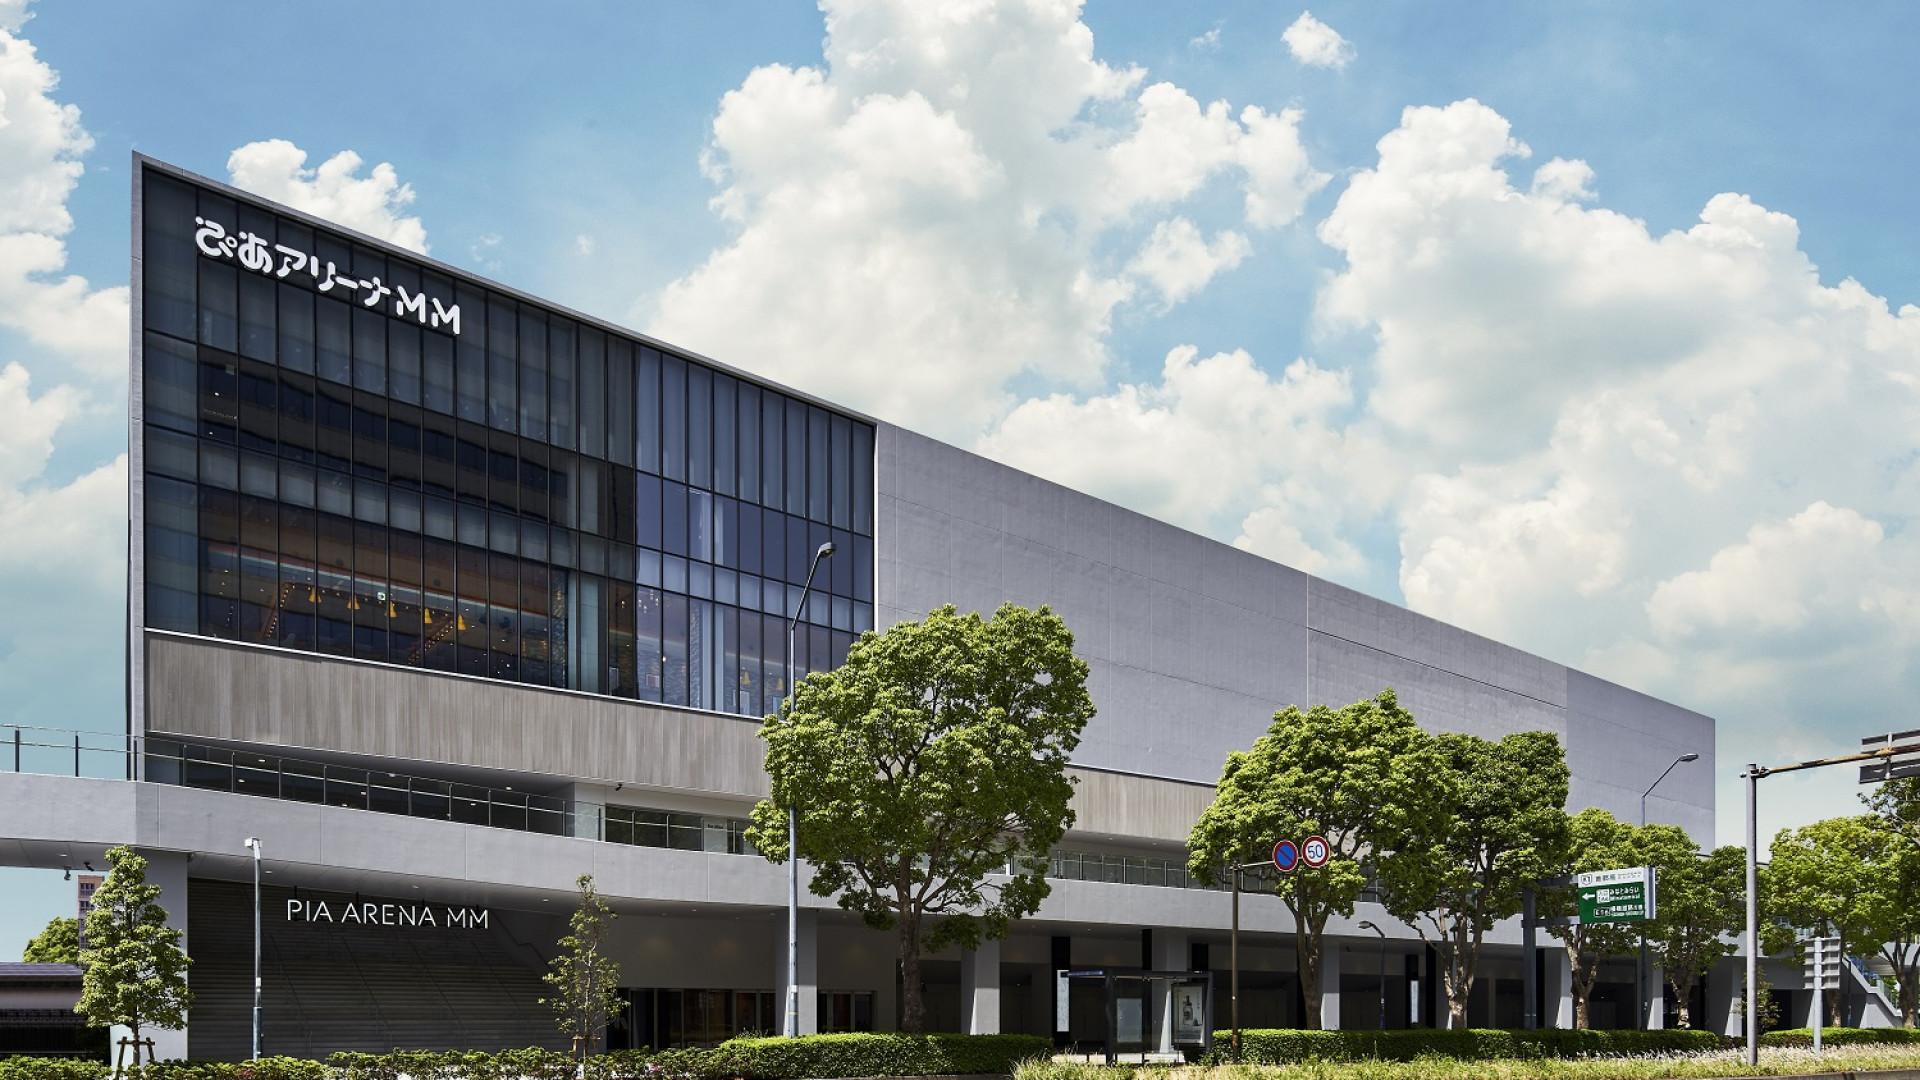 PIA Arena MM